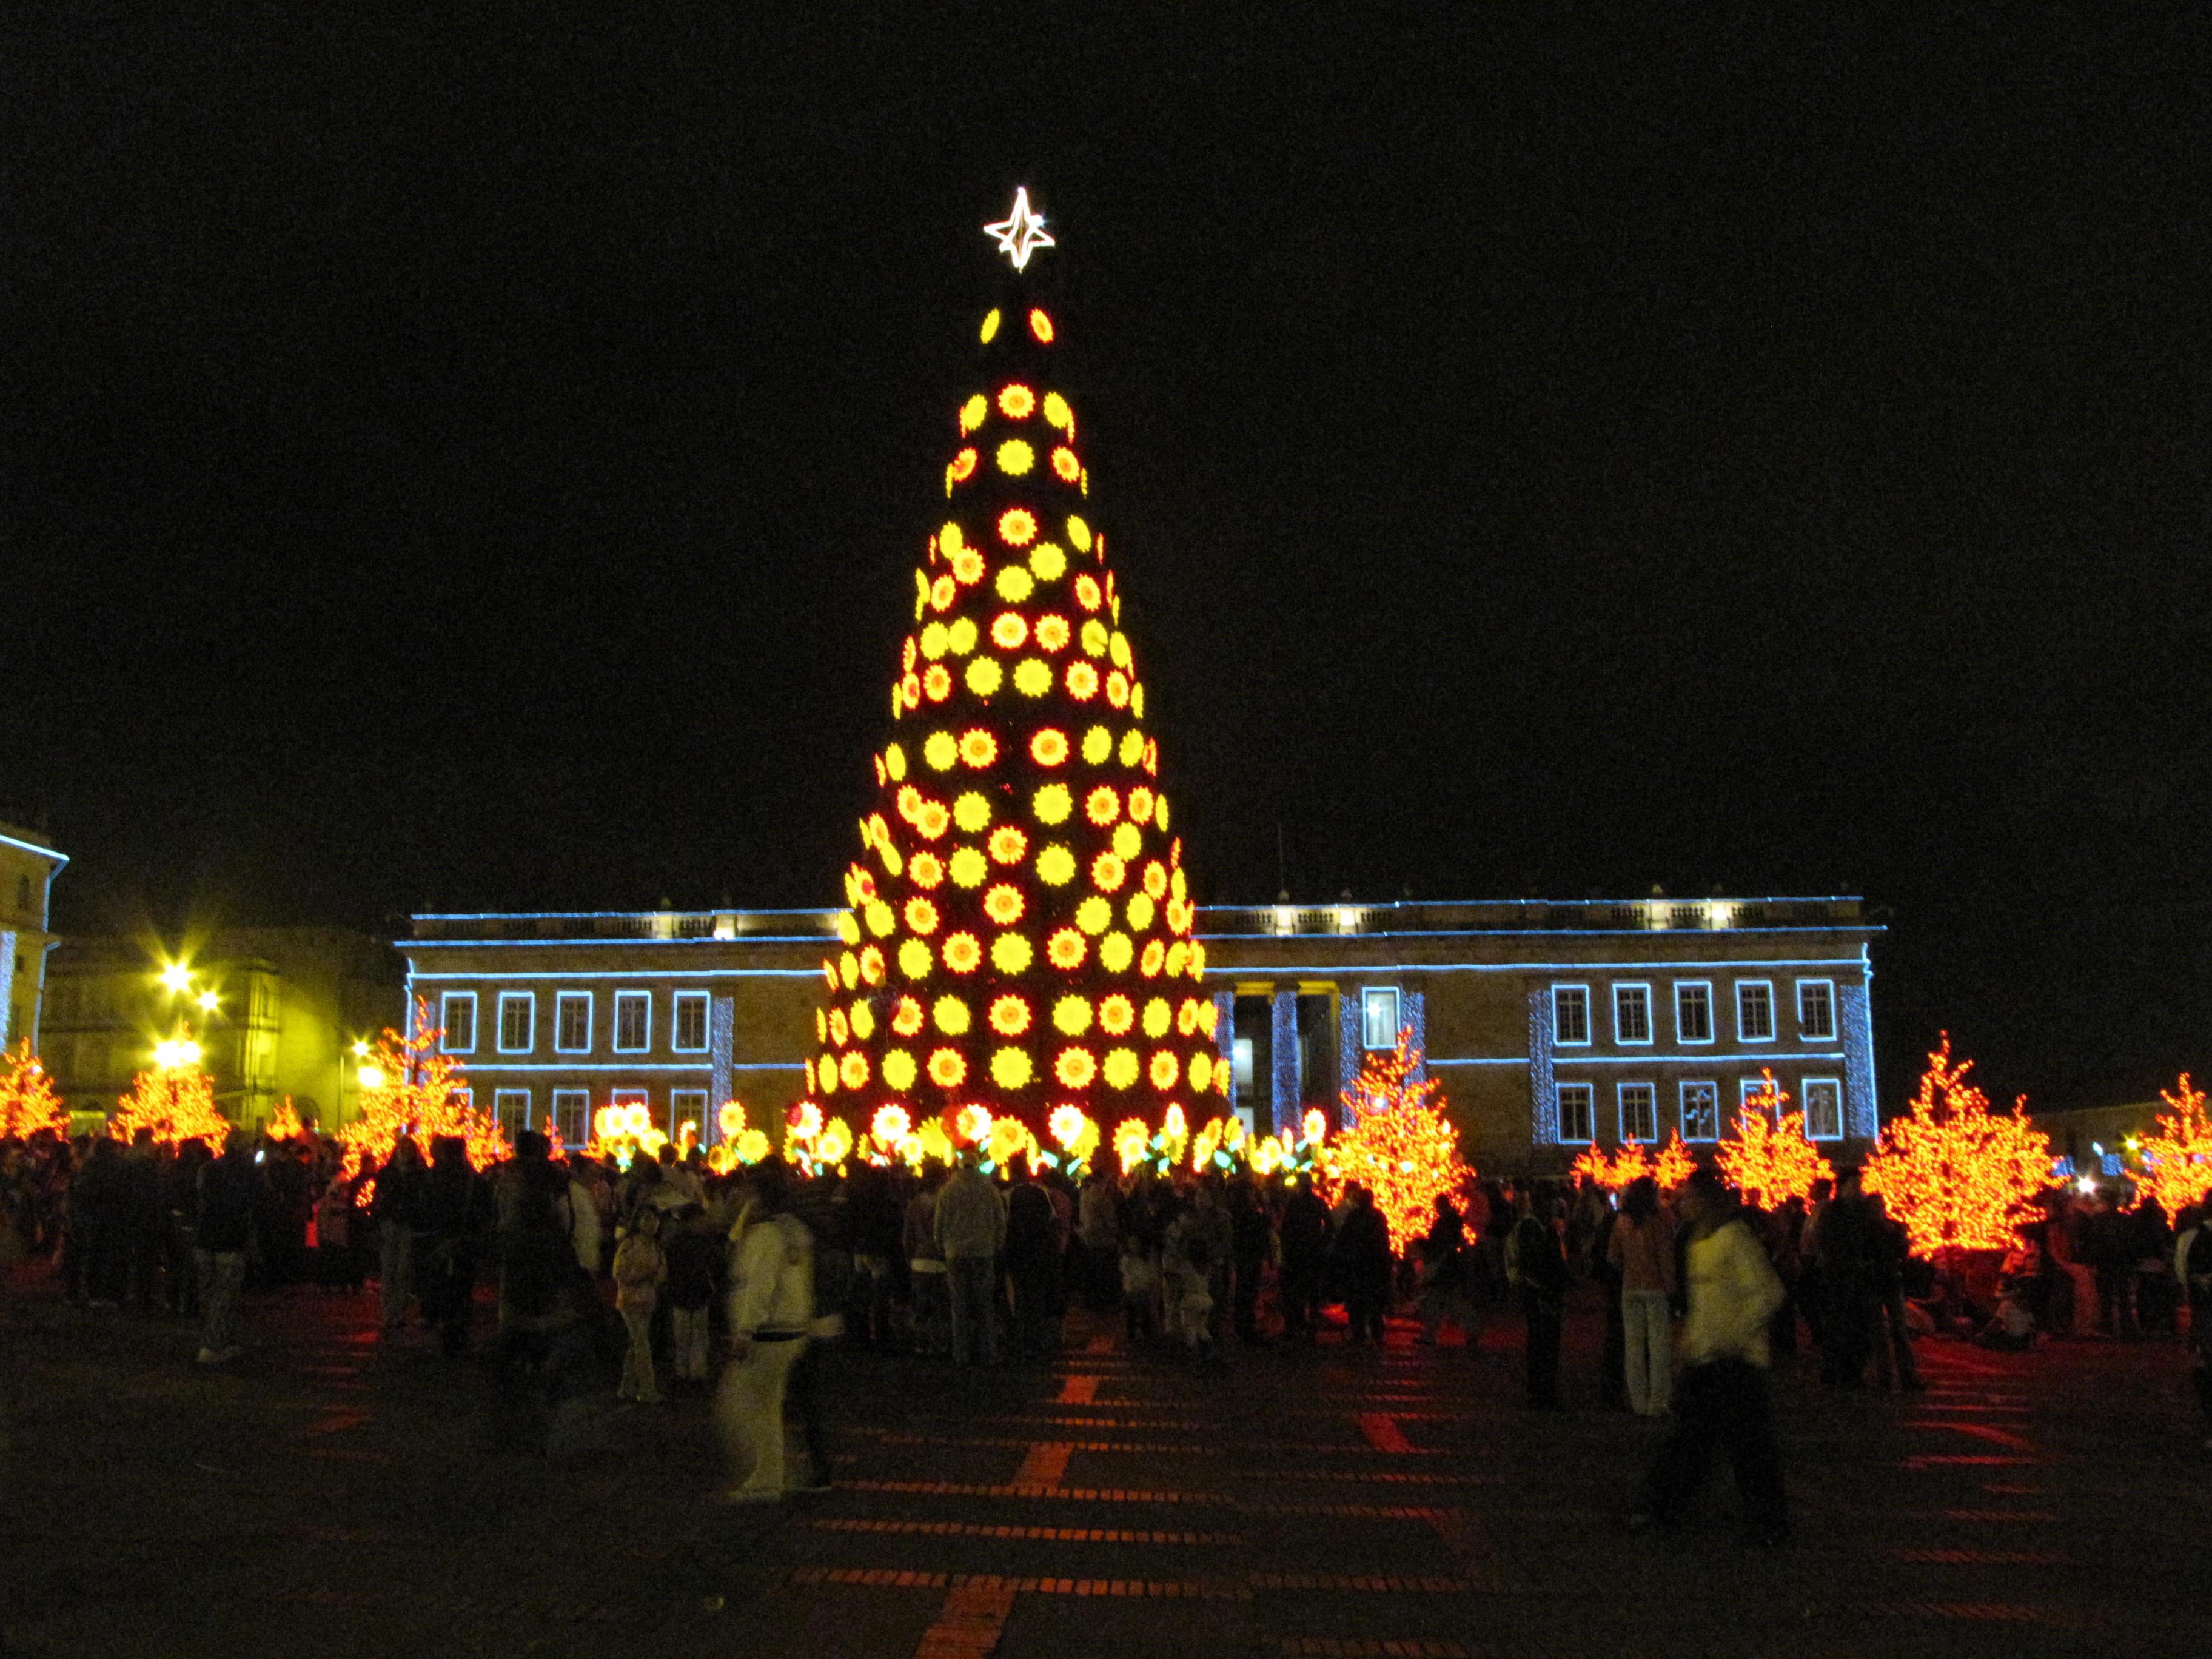 Generic Christmas Decorations